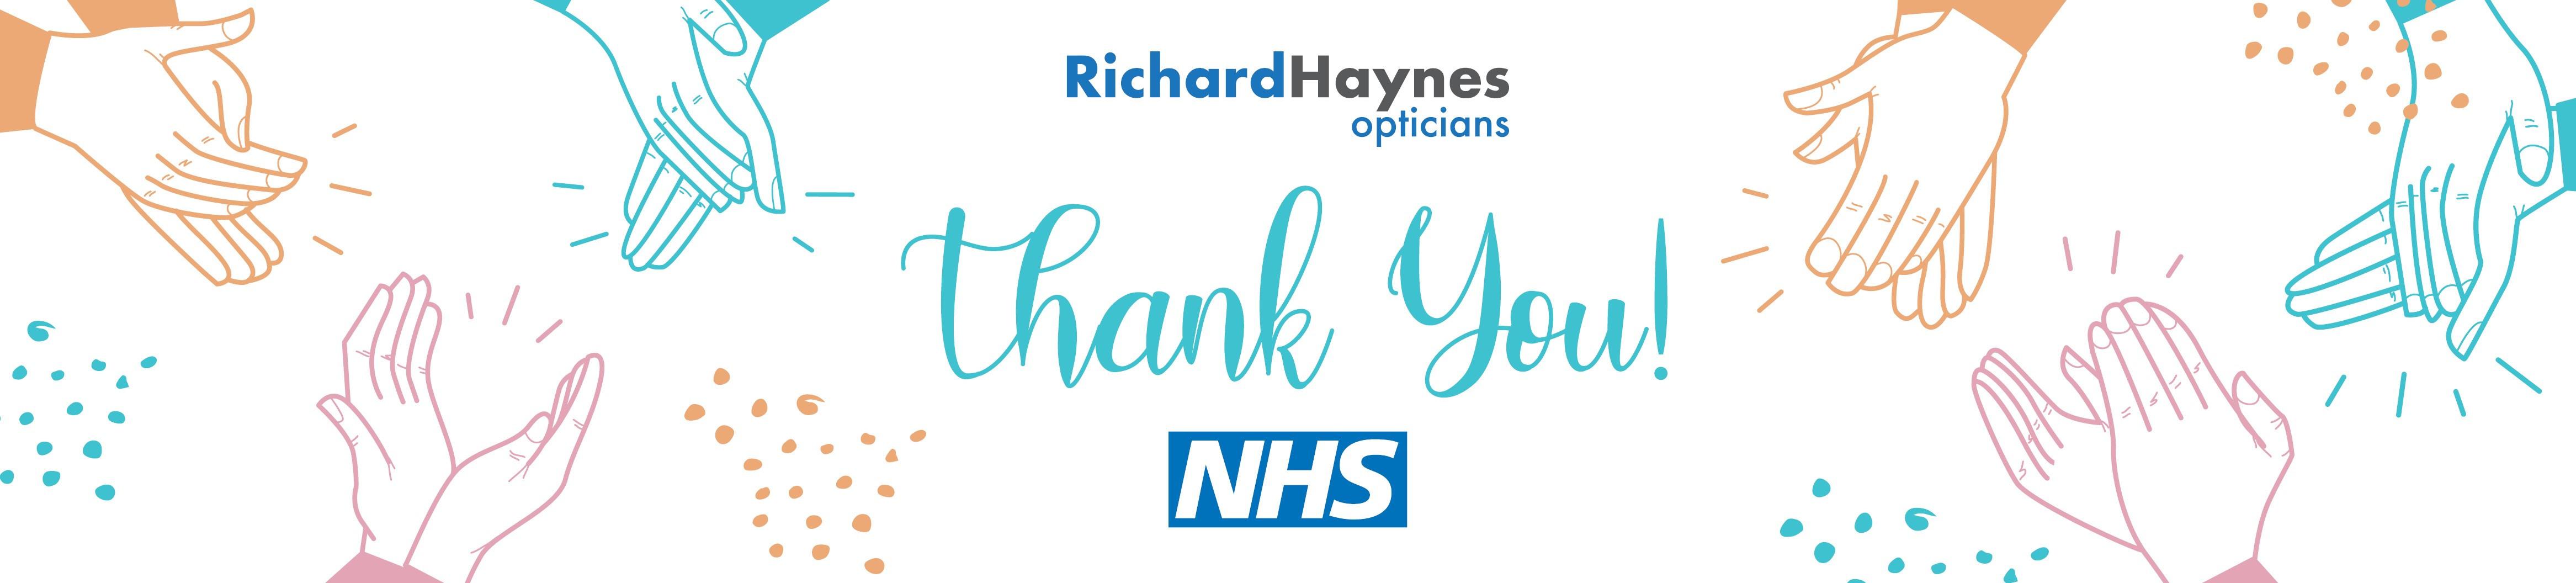 Richard Haynes thank you NHS.jpg